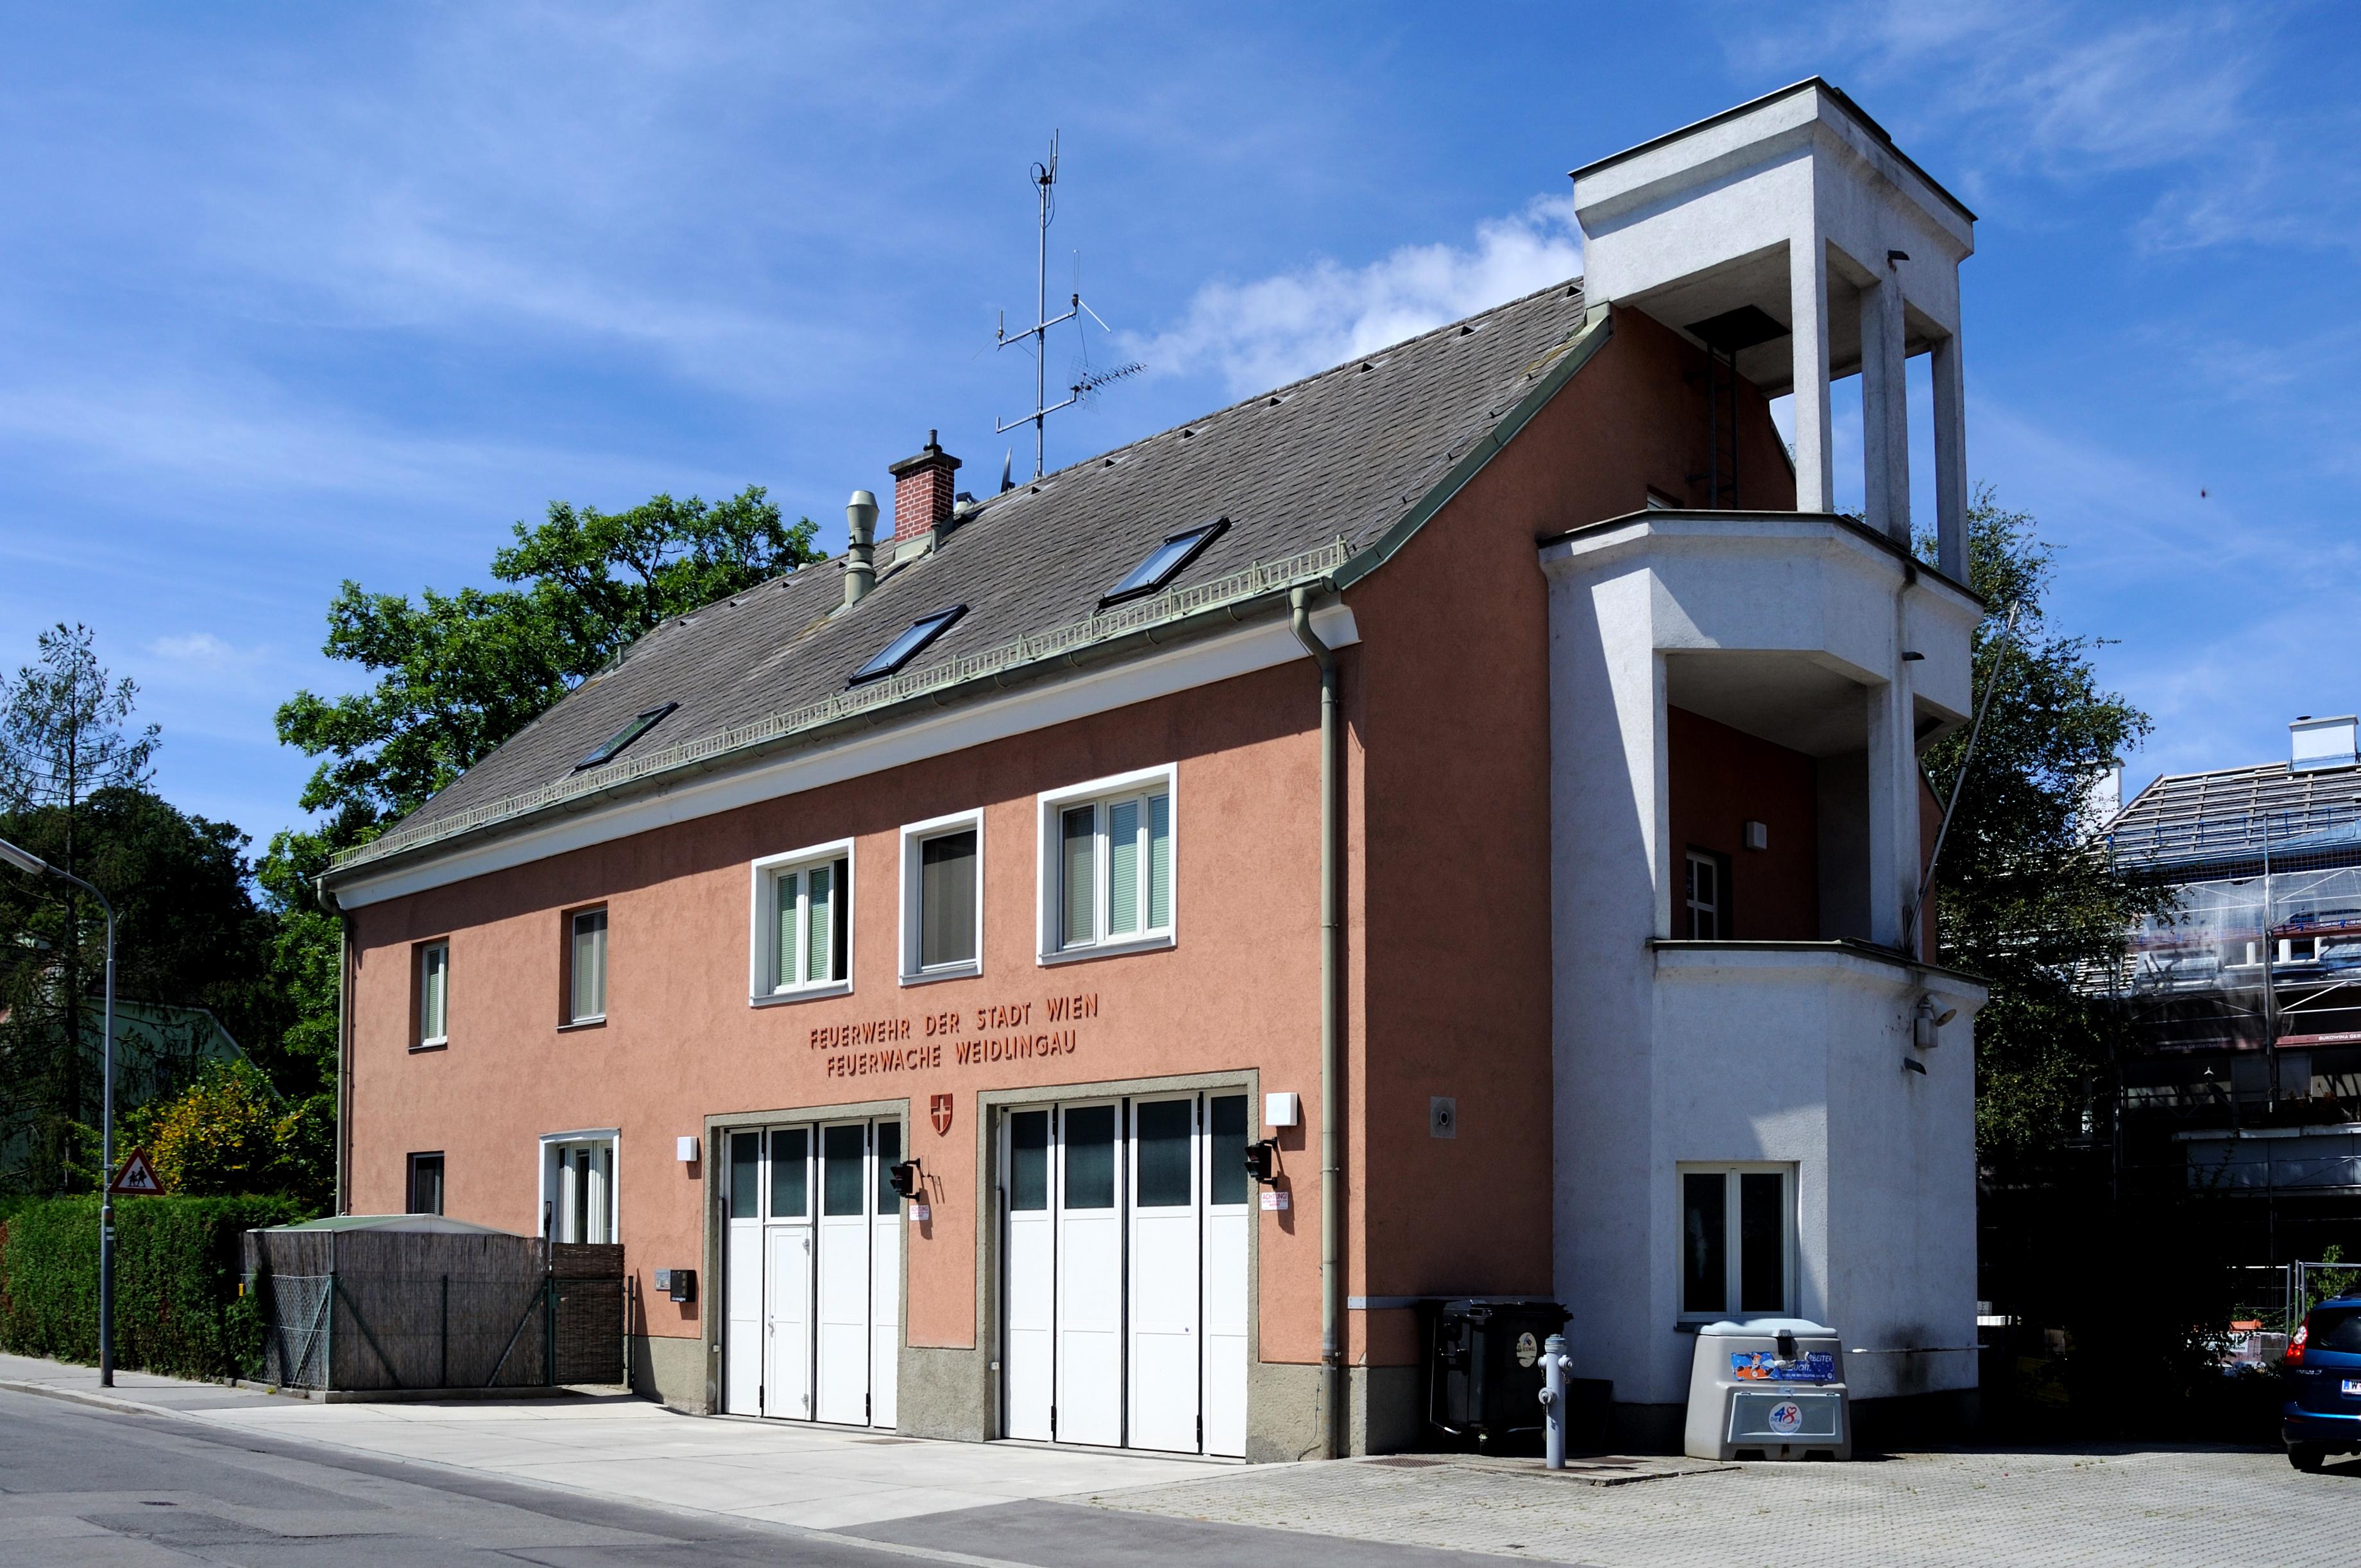 Feuerwache Weidlingau.jpg